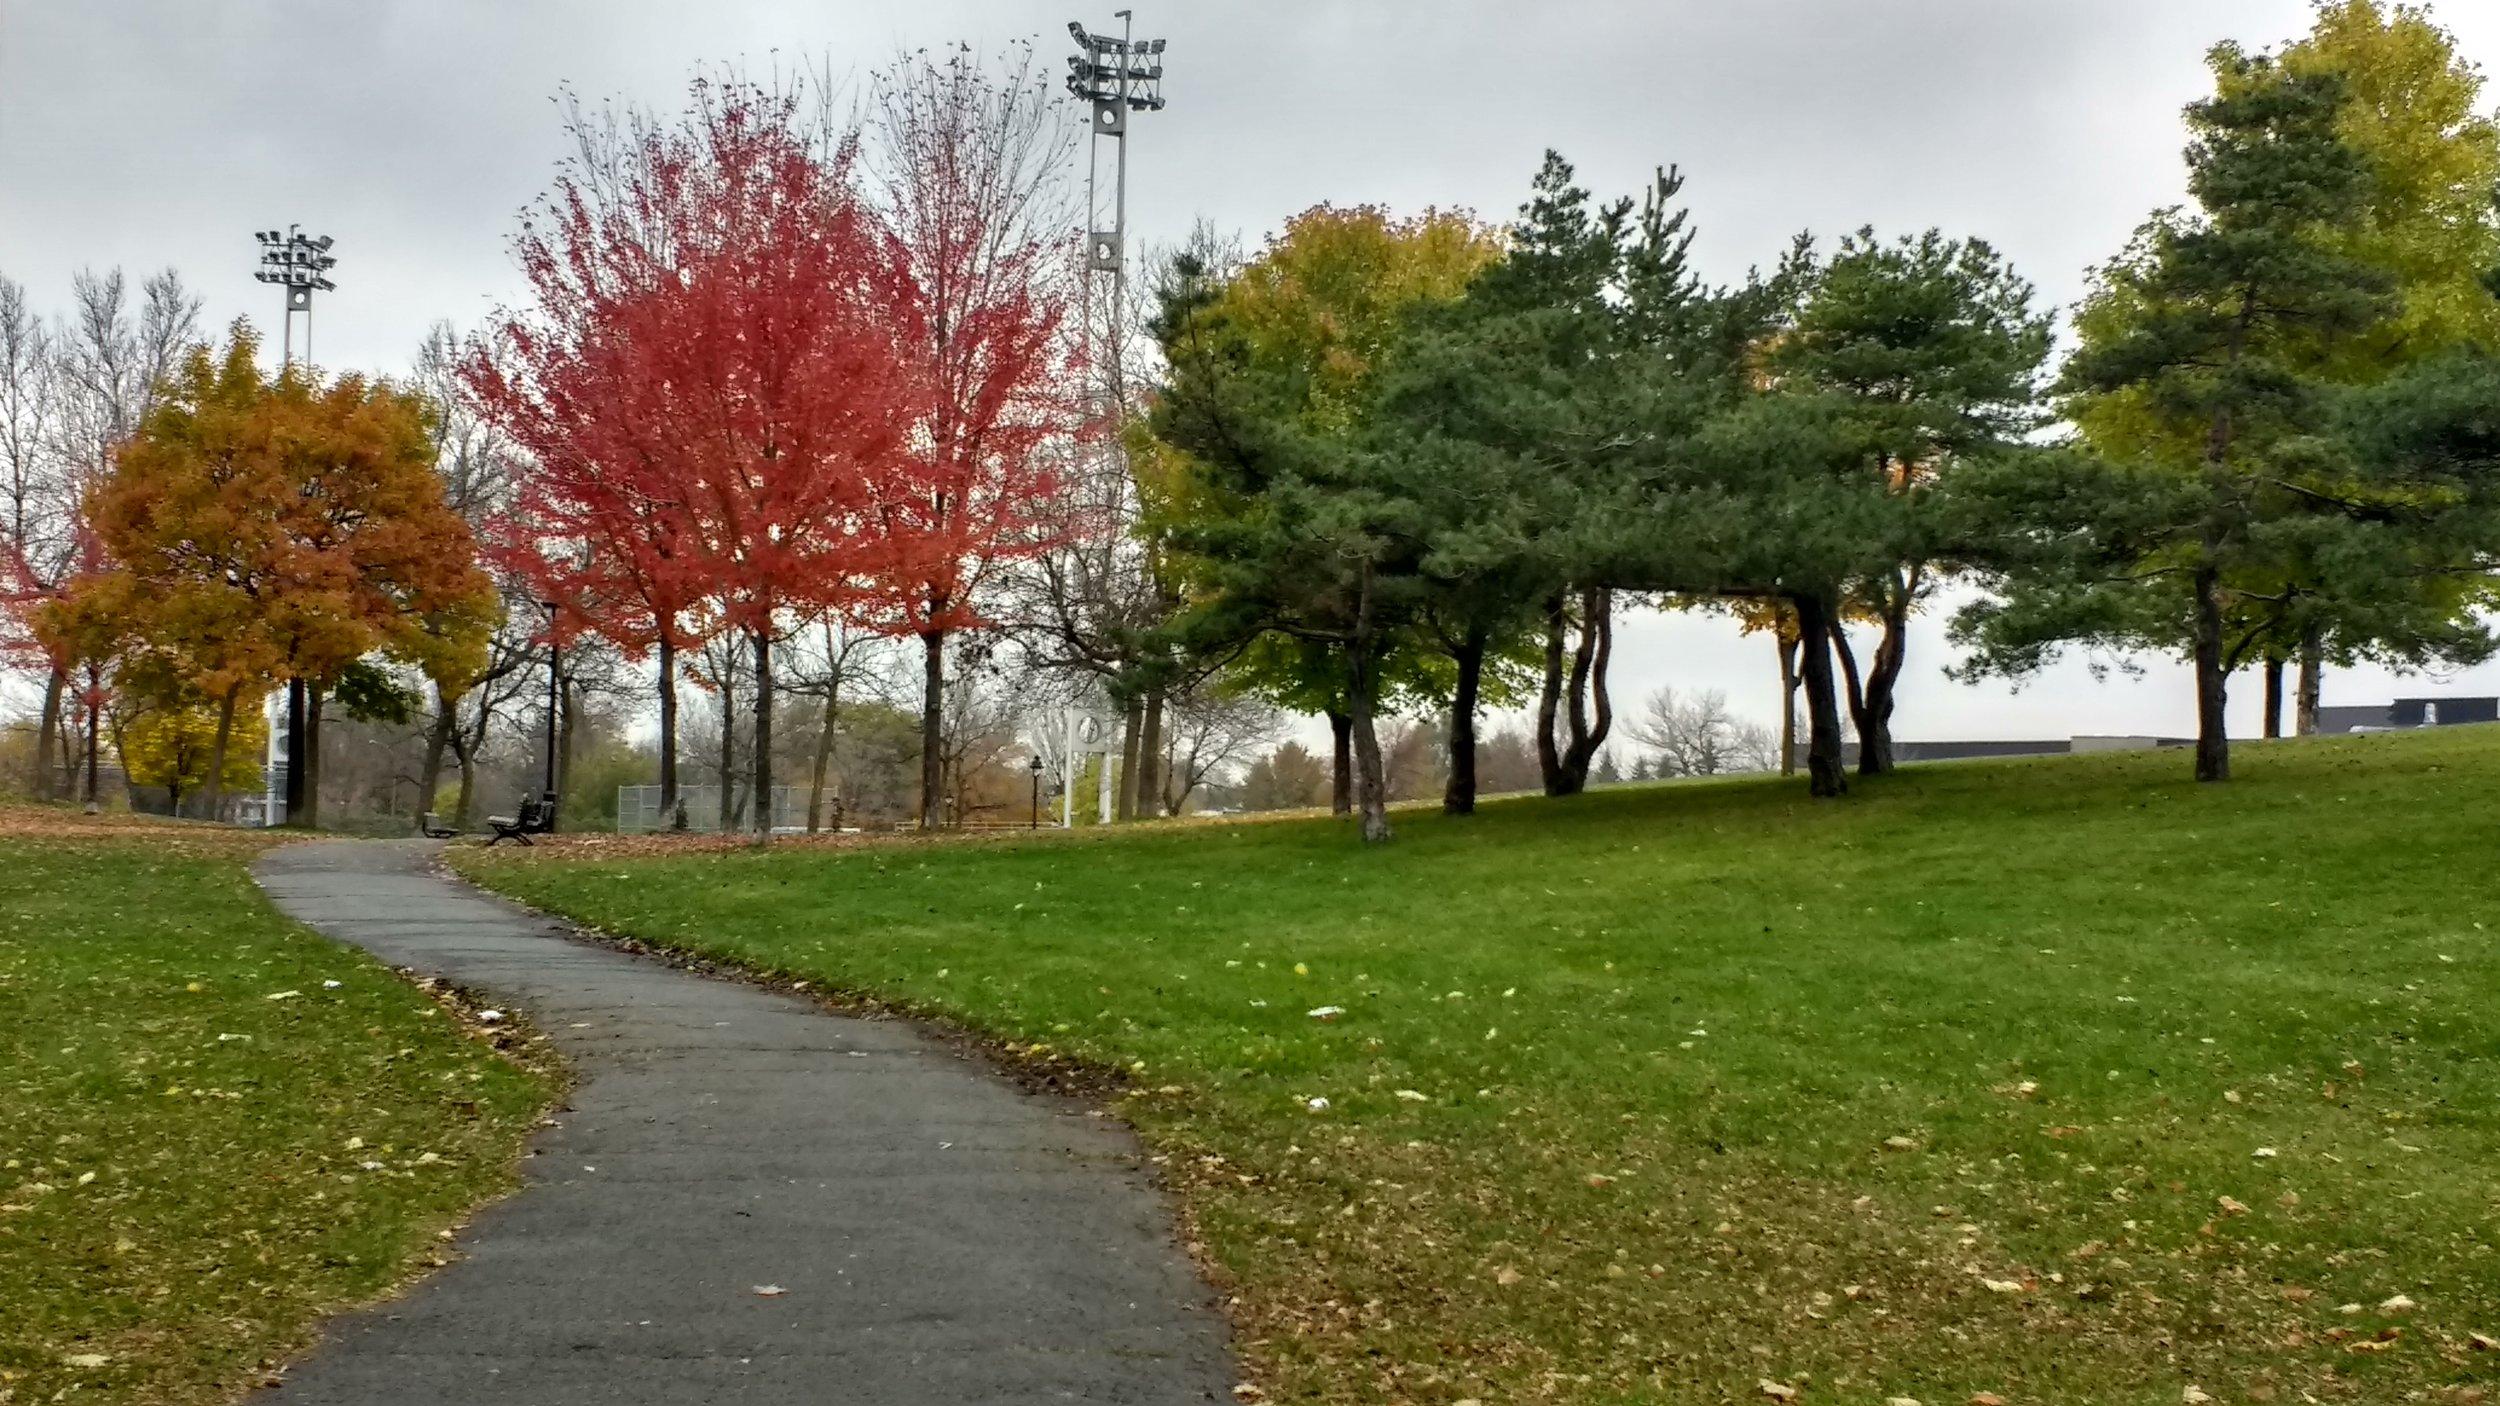 Local park still has the Autumn colours